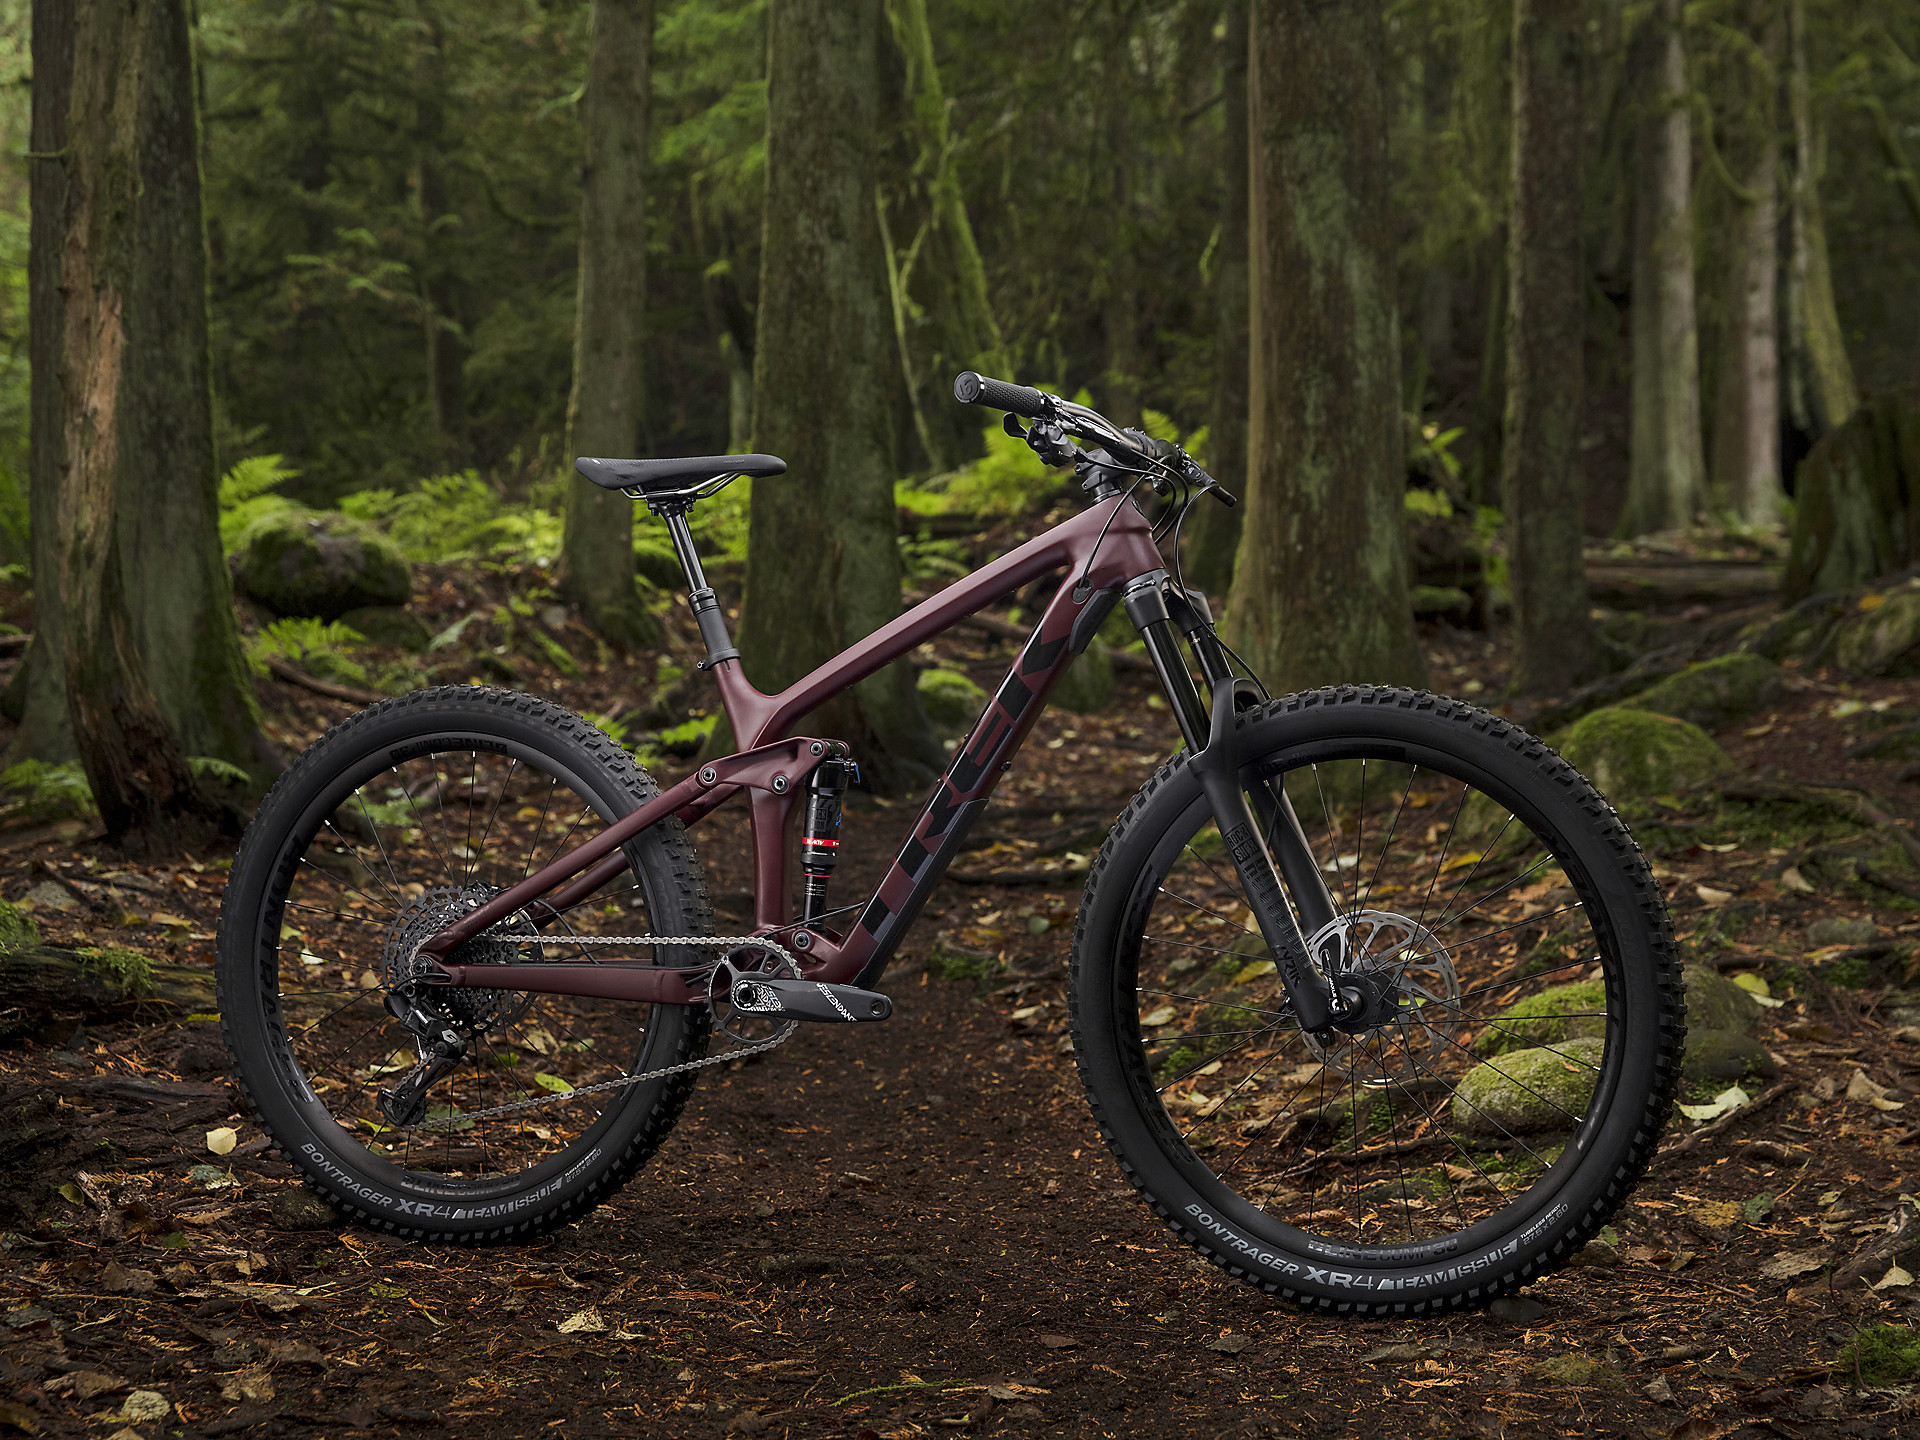 fb6270fe1fc Remedy 9.7 | Trek Bikes